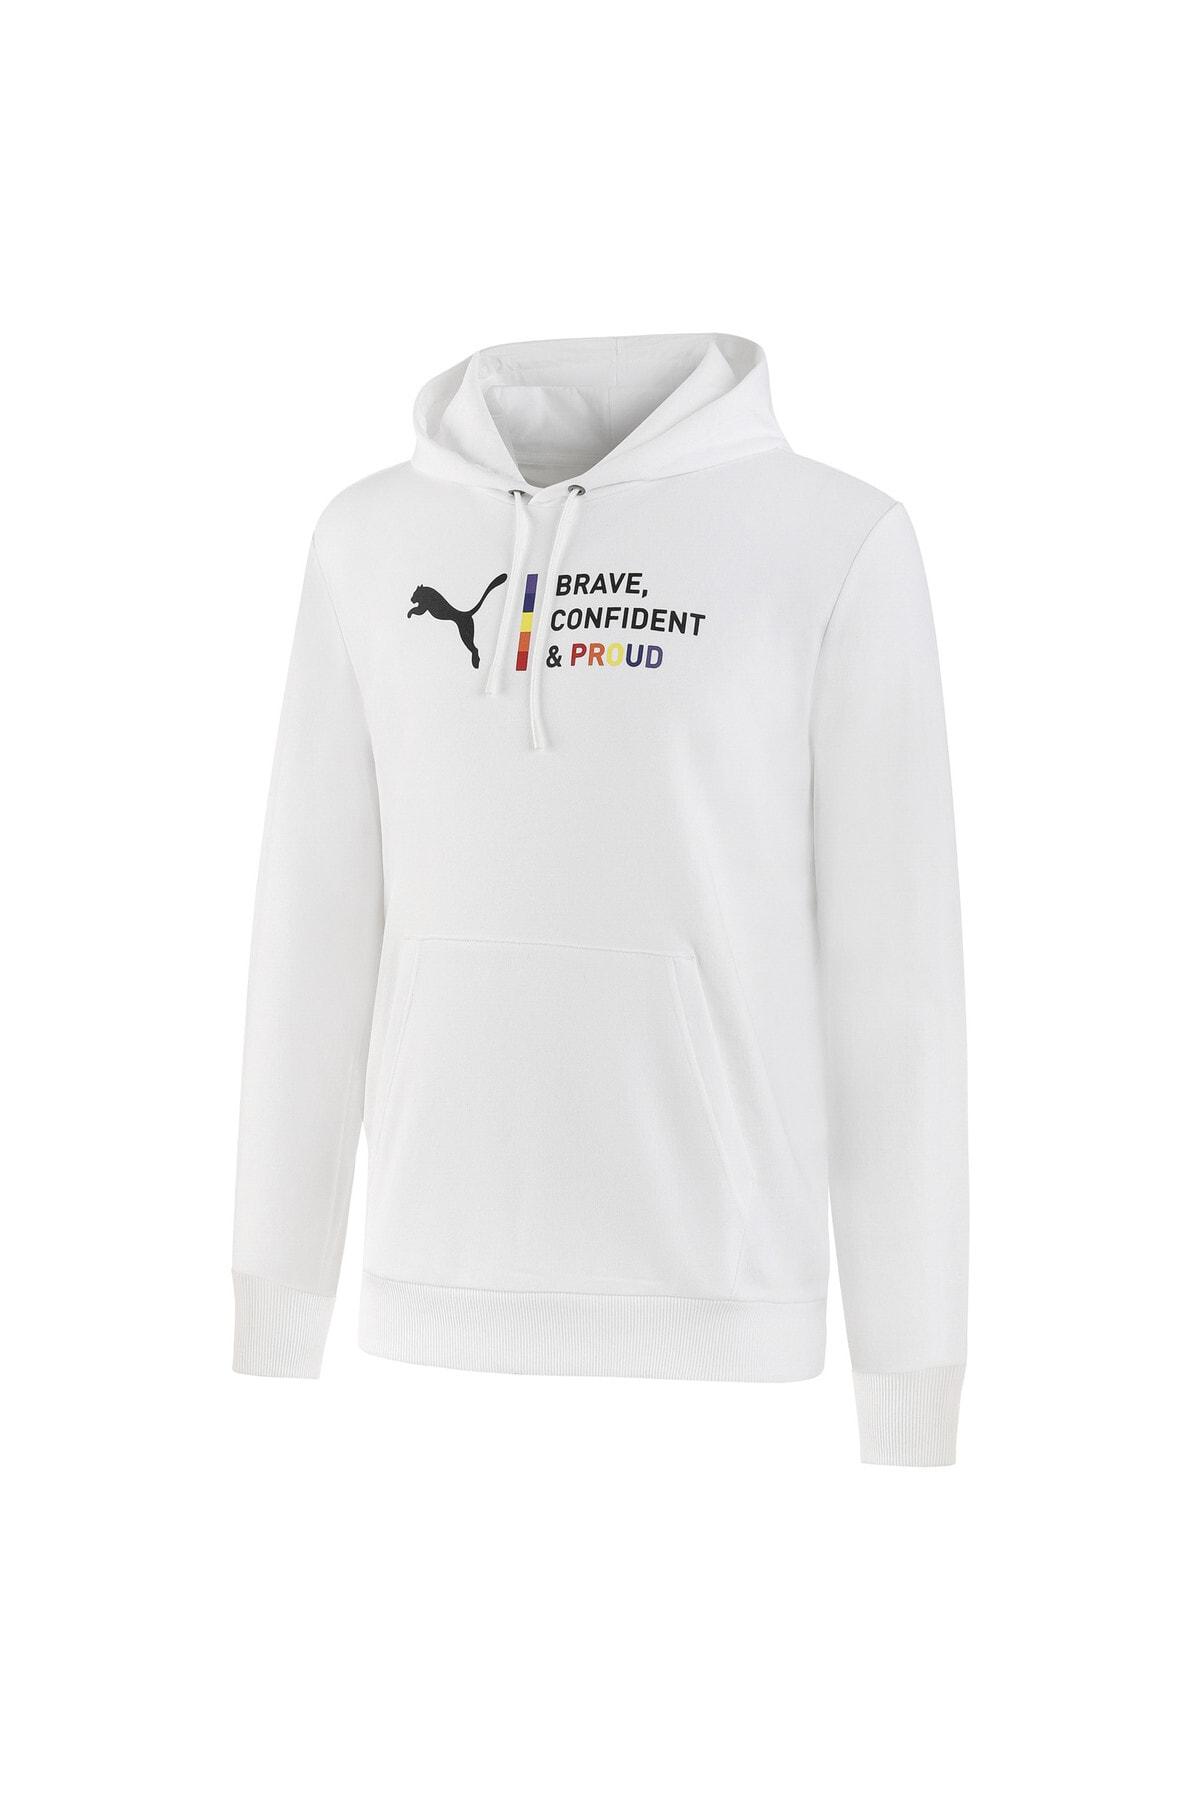 Puma Erkek Spor Sweatshirt - 84808702